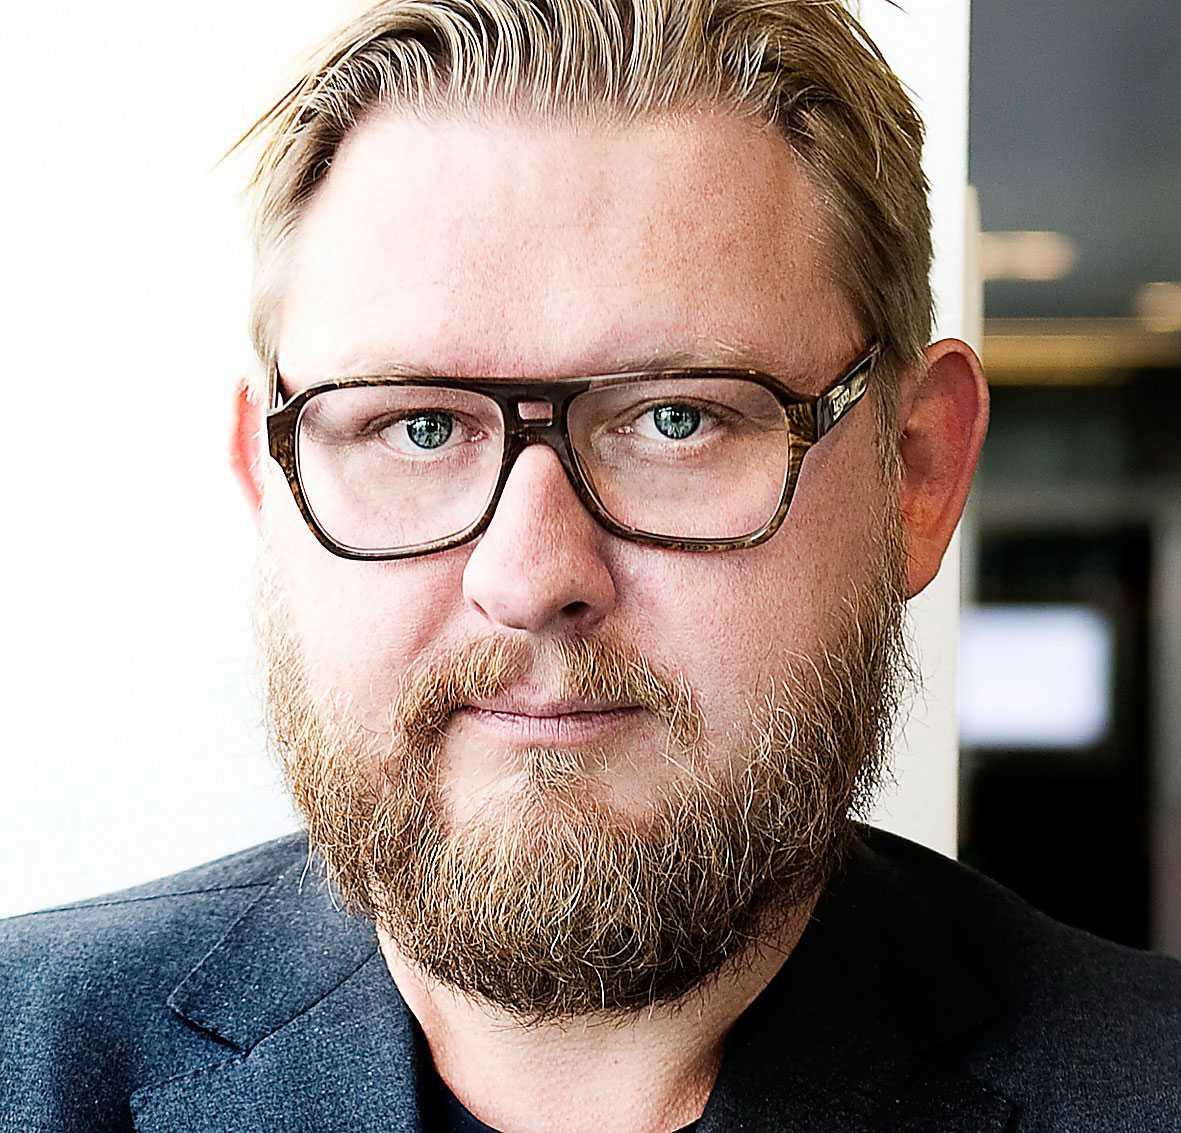 Fredrik Virtanen